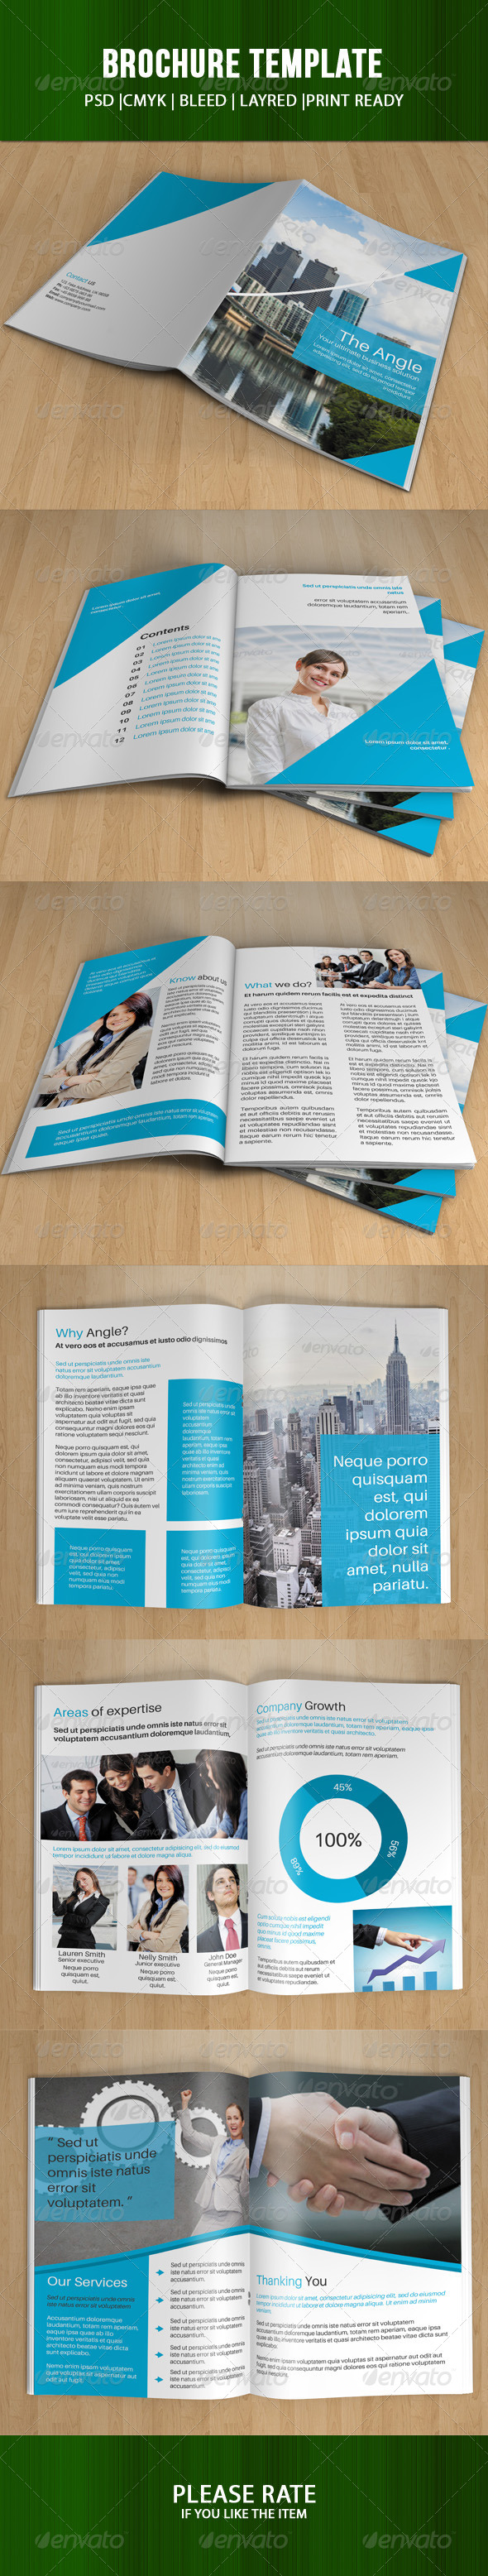 Corporate Brochure-V59 - Corporate Brochures